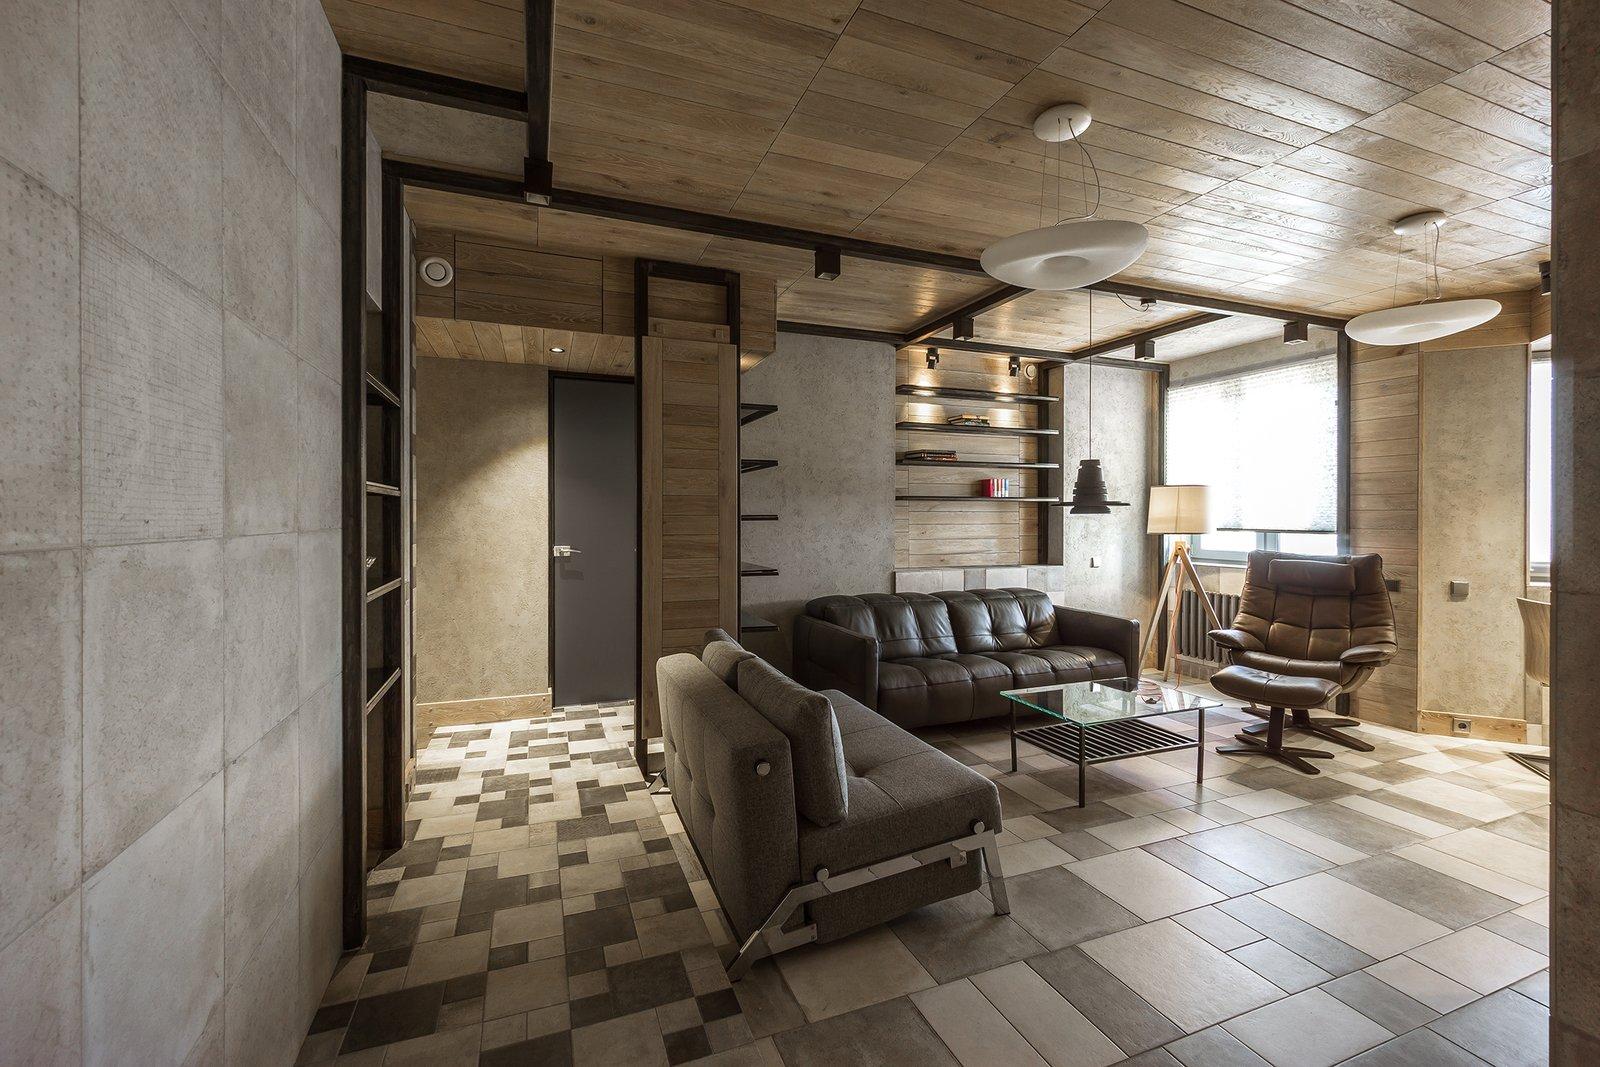 Living Room, Chair, Sofa, Bookcase, Coffee Tables, Floor Lighting, Pendant Lighting, Ceramic Tile Floor, and Ceiling Lighting Living room  NagatinSky by Alexey Rozenberg